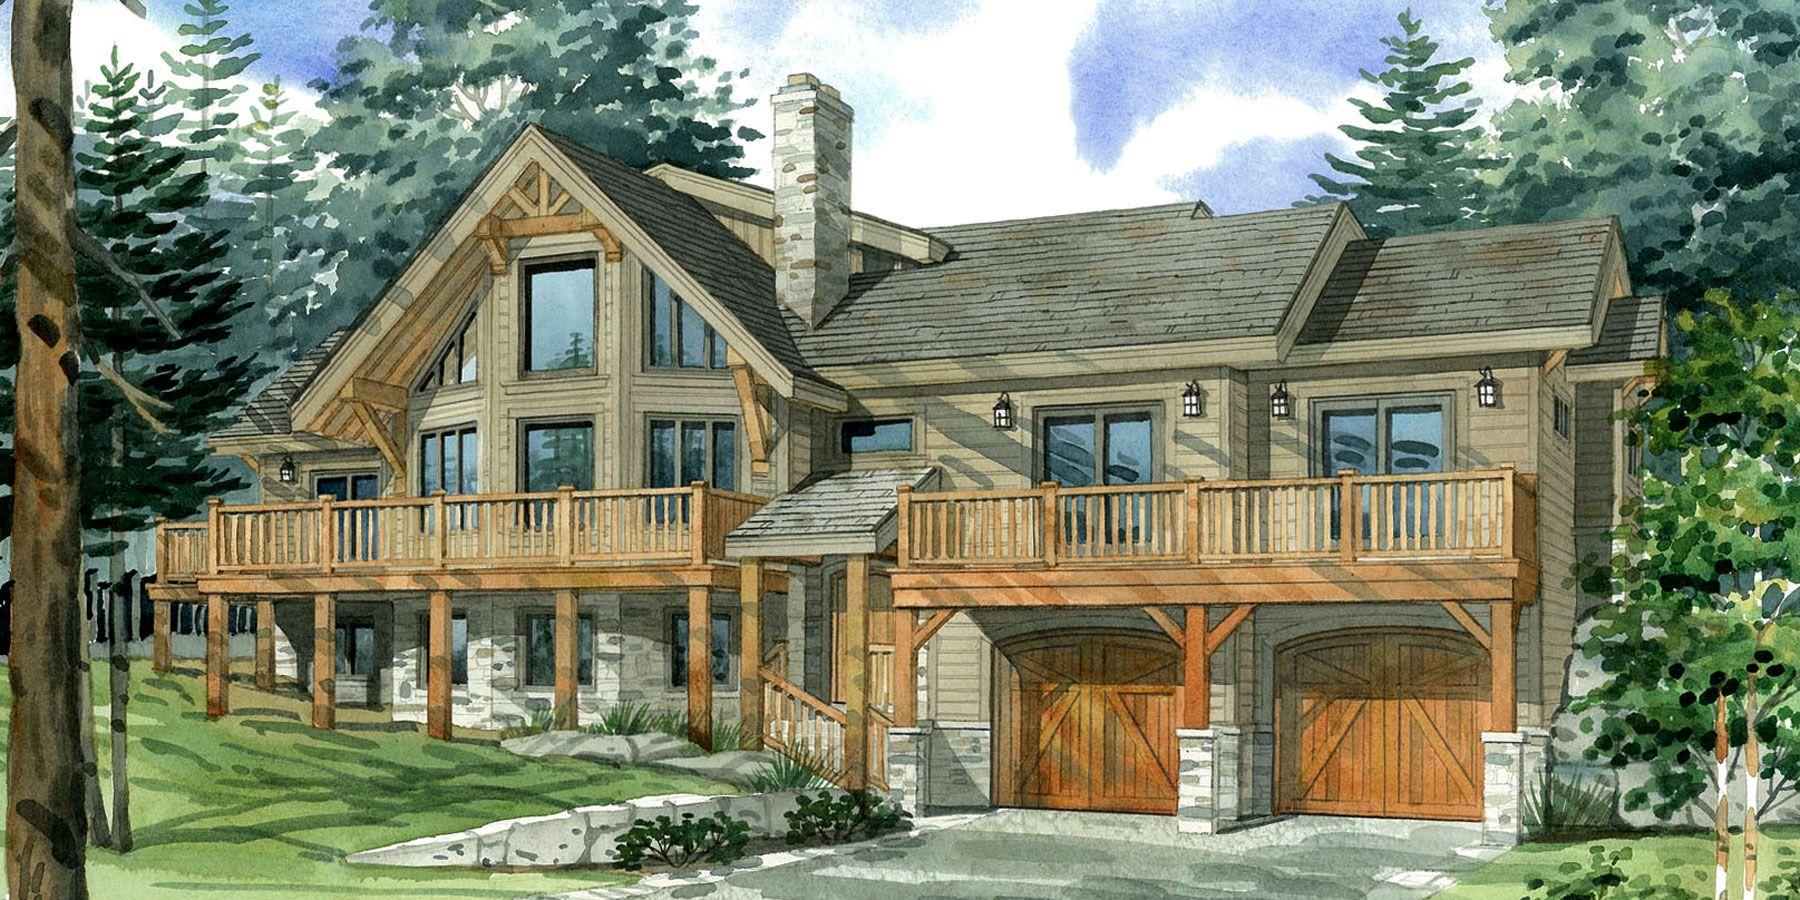 Cajun Cottage House Plans Storybookcottagehouseplansfree Cottage House Plans Mountain Home Exterior Log Homes Exterior